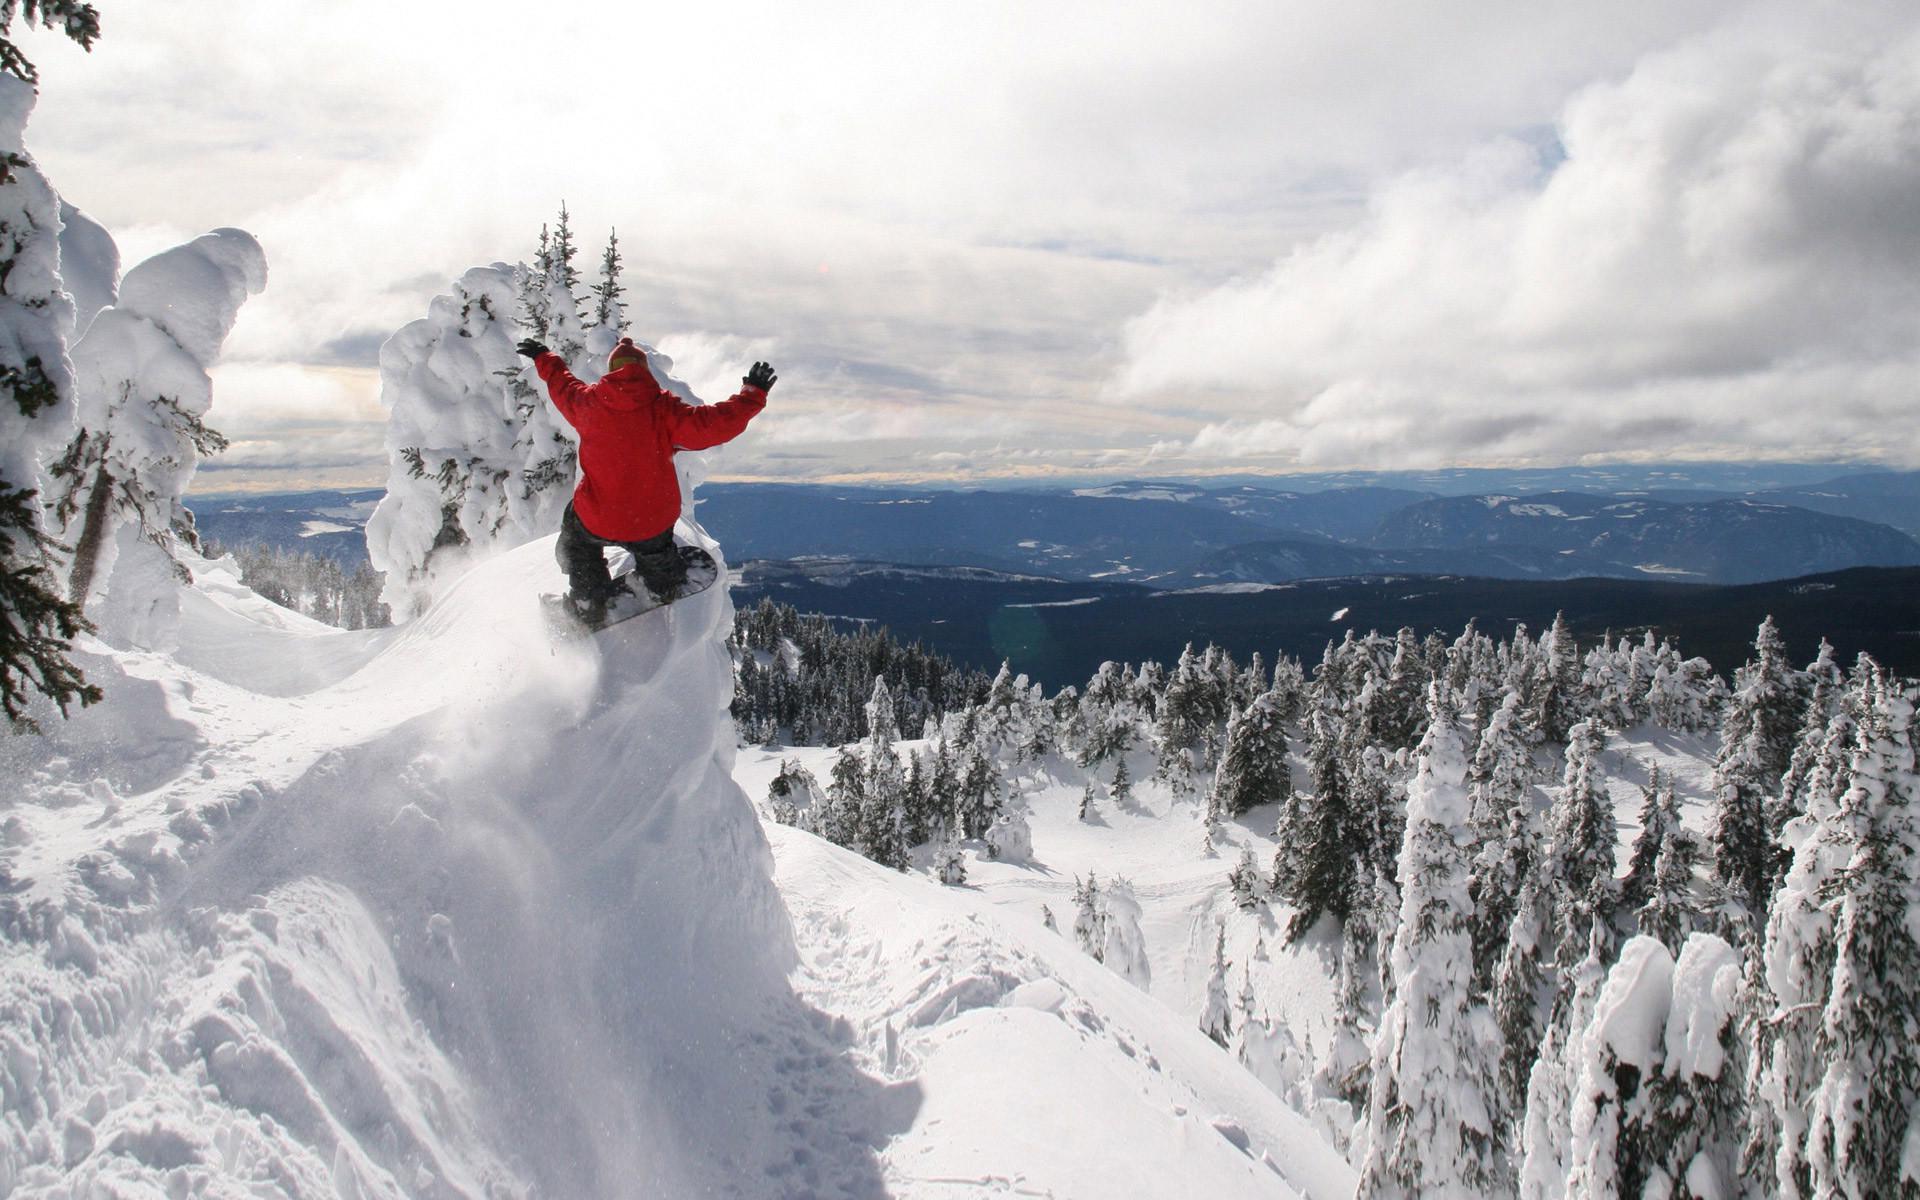 extreme-snowboarding-hd-widescreen—hd-free-wallpaper.